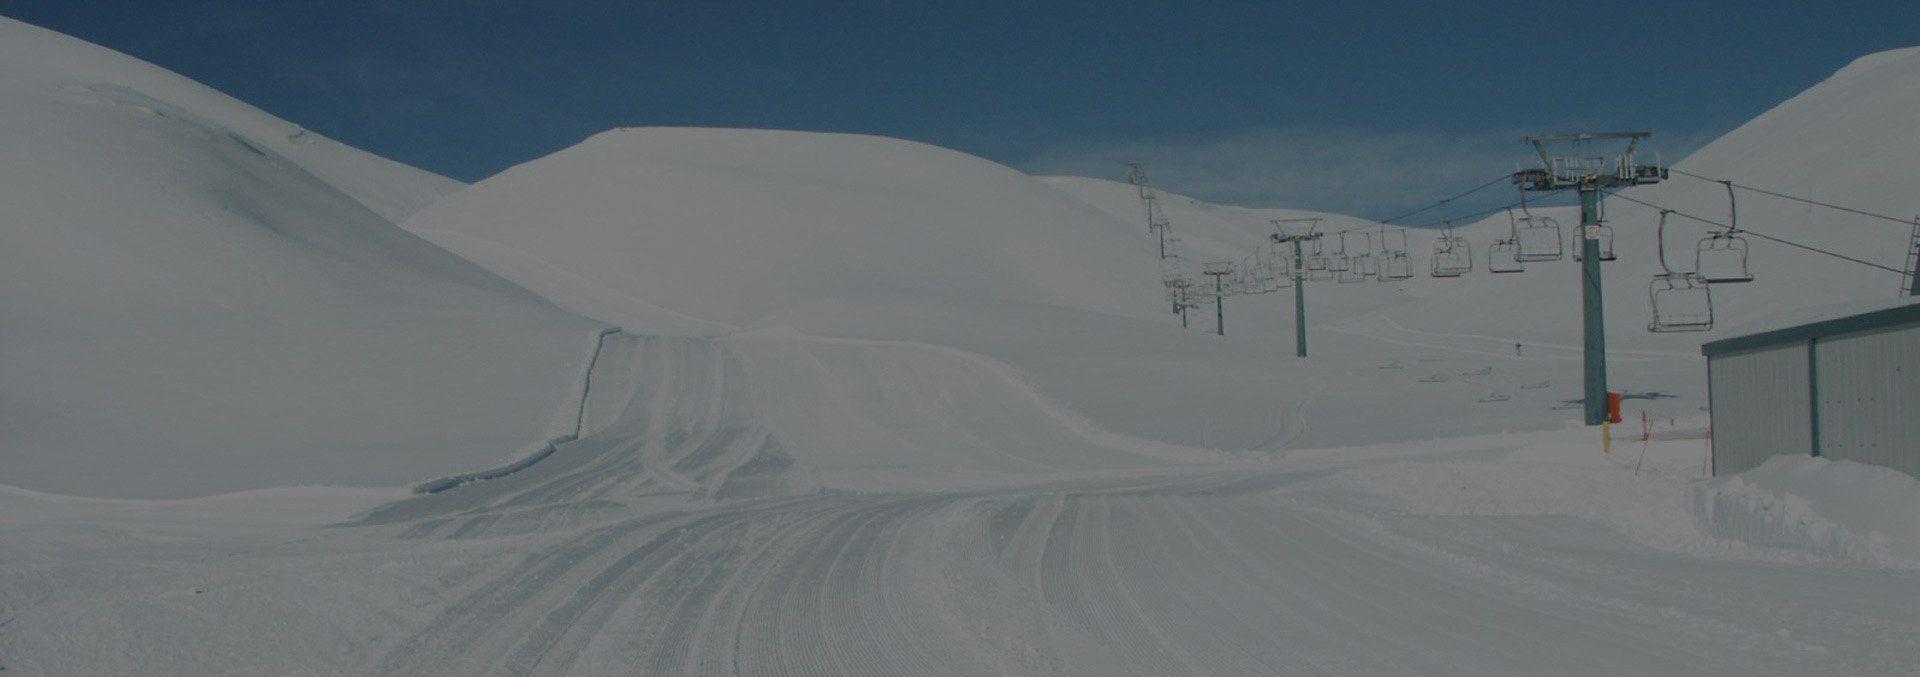 Aremogna slopes